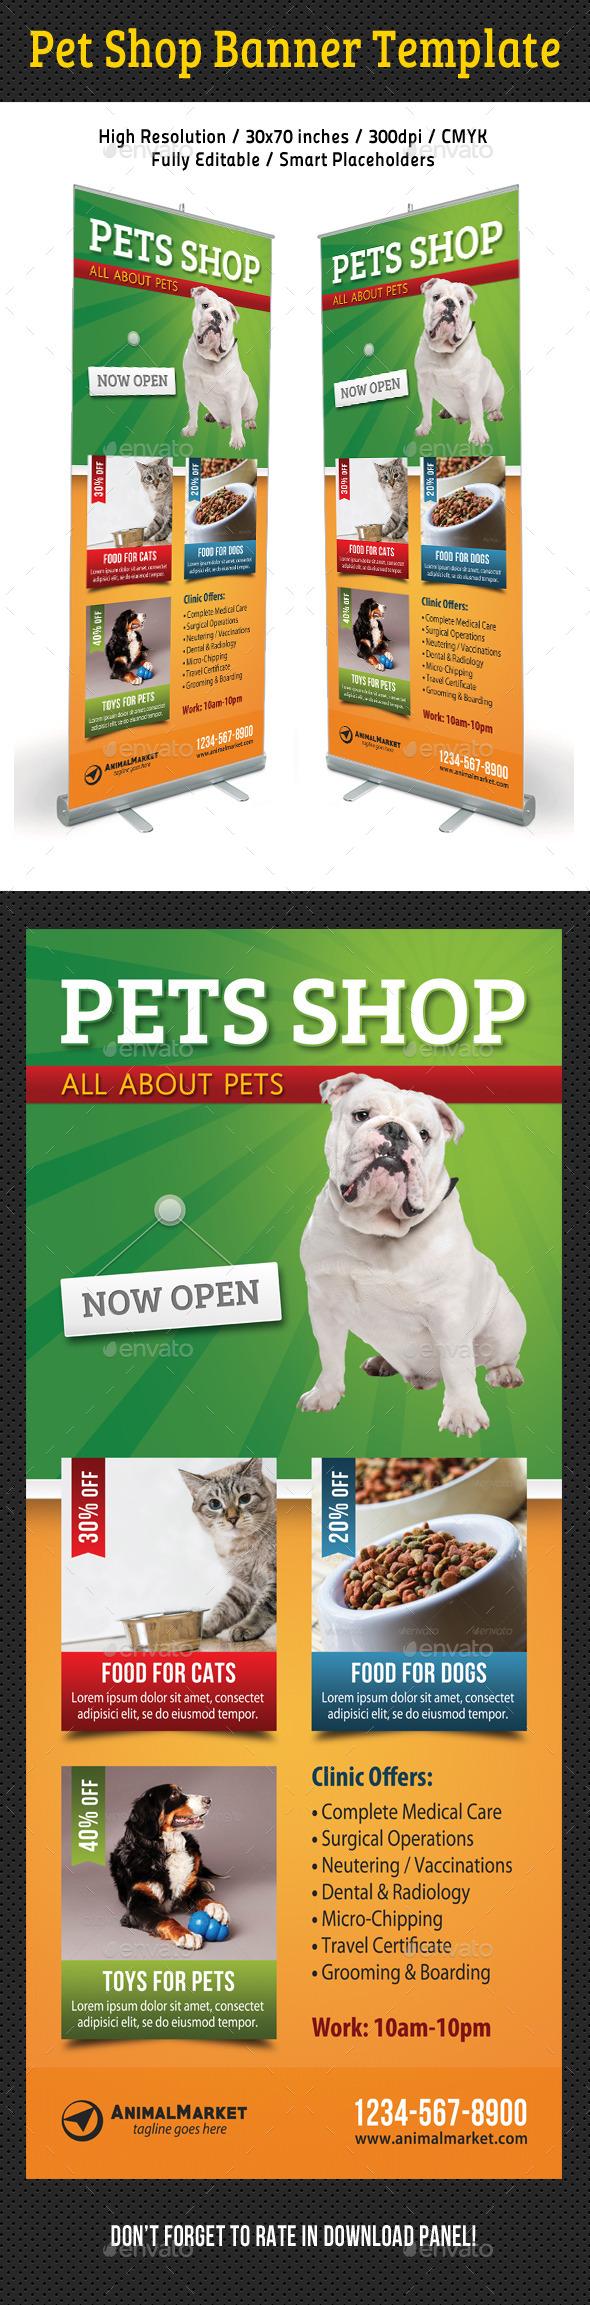 GraphicRiver Pet Shop Banner Template 11121879